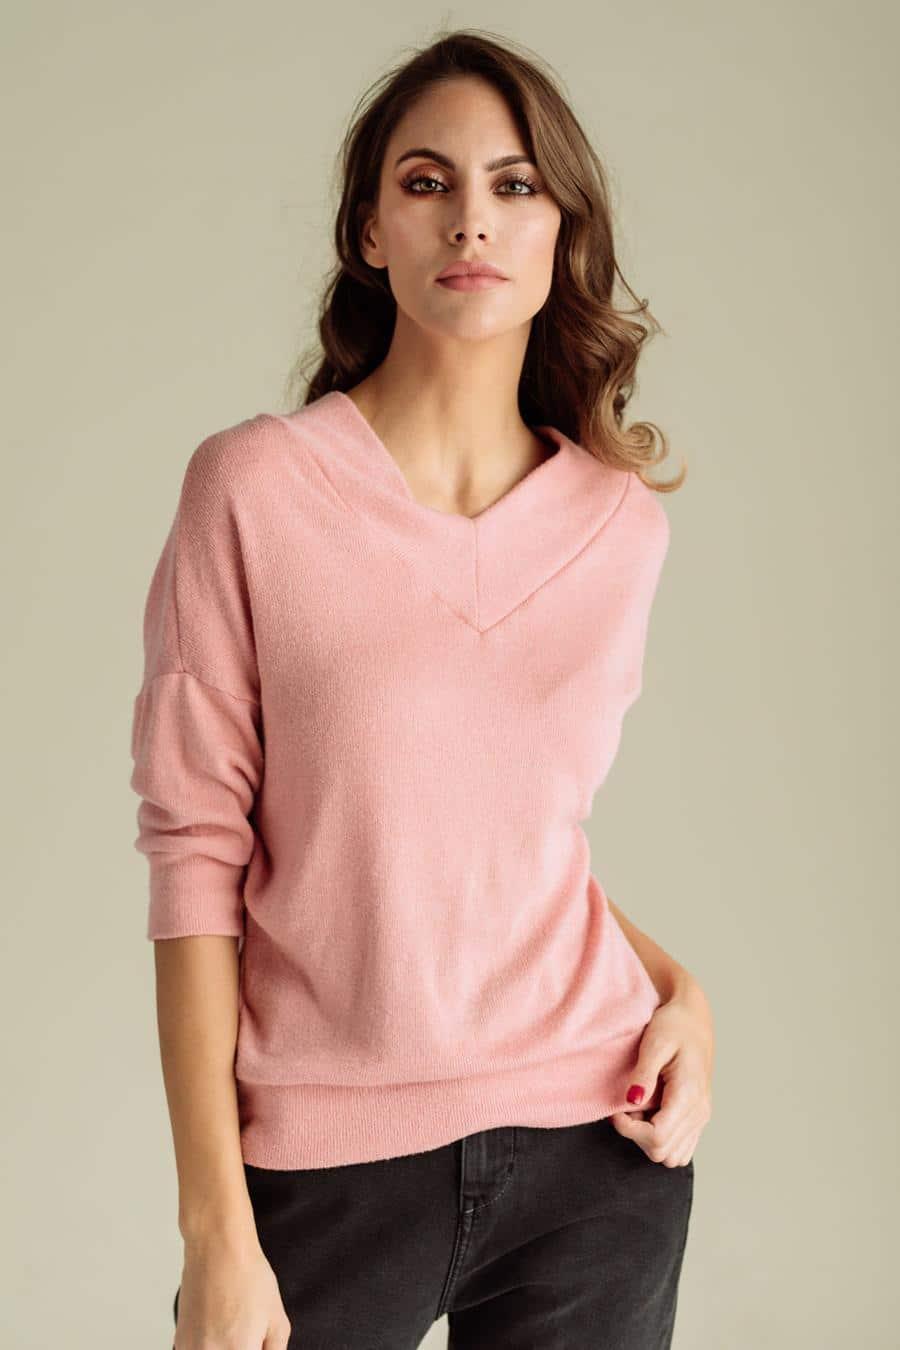 Jagger Zenska Bluza Kolekcija Prolece Leto Ss2021 Kupi Online Jg 9267 10 1 New